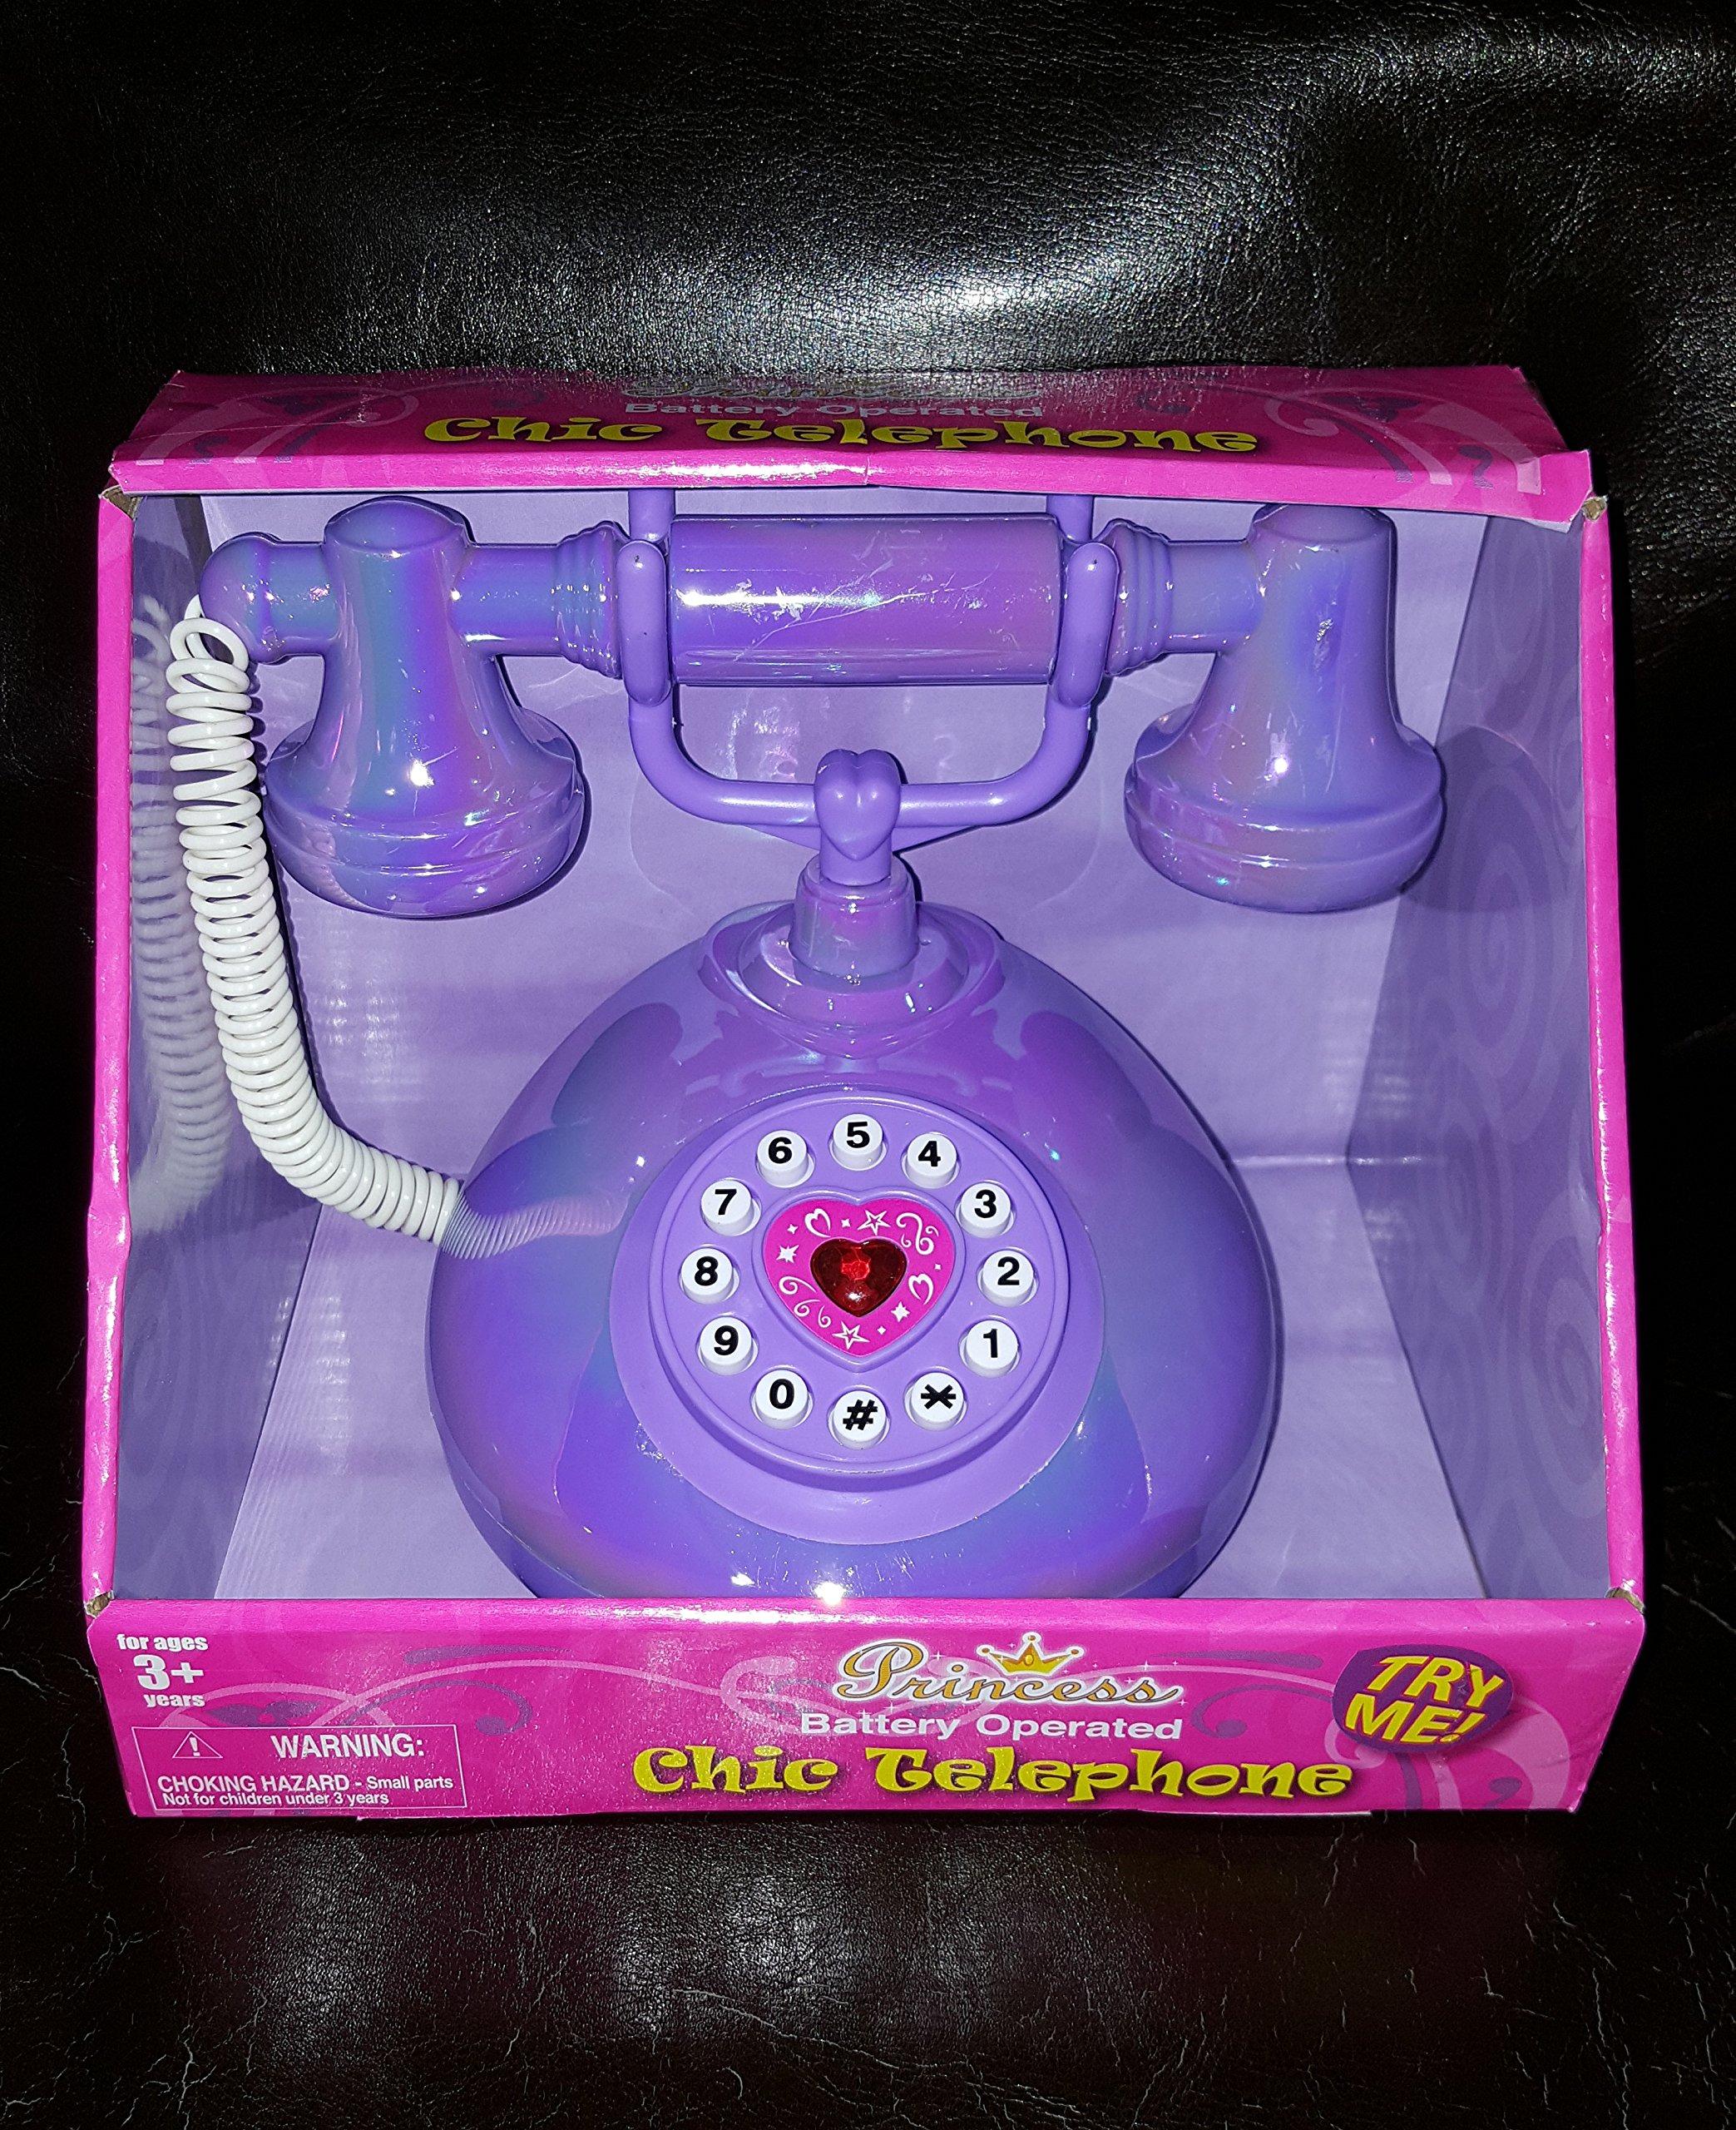 Princess Chic Battery Operated Telephone Purple